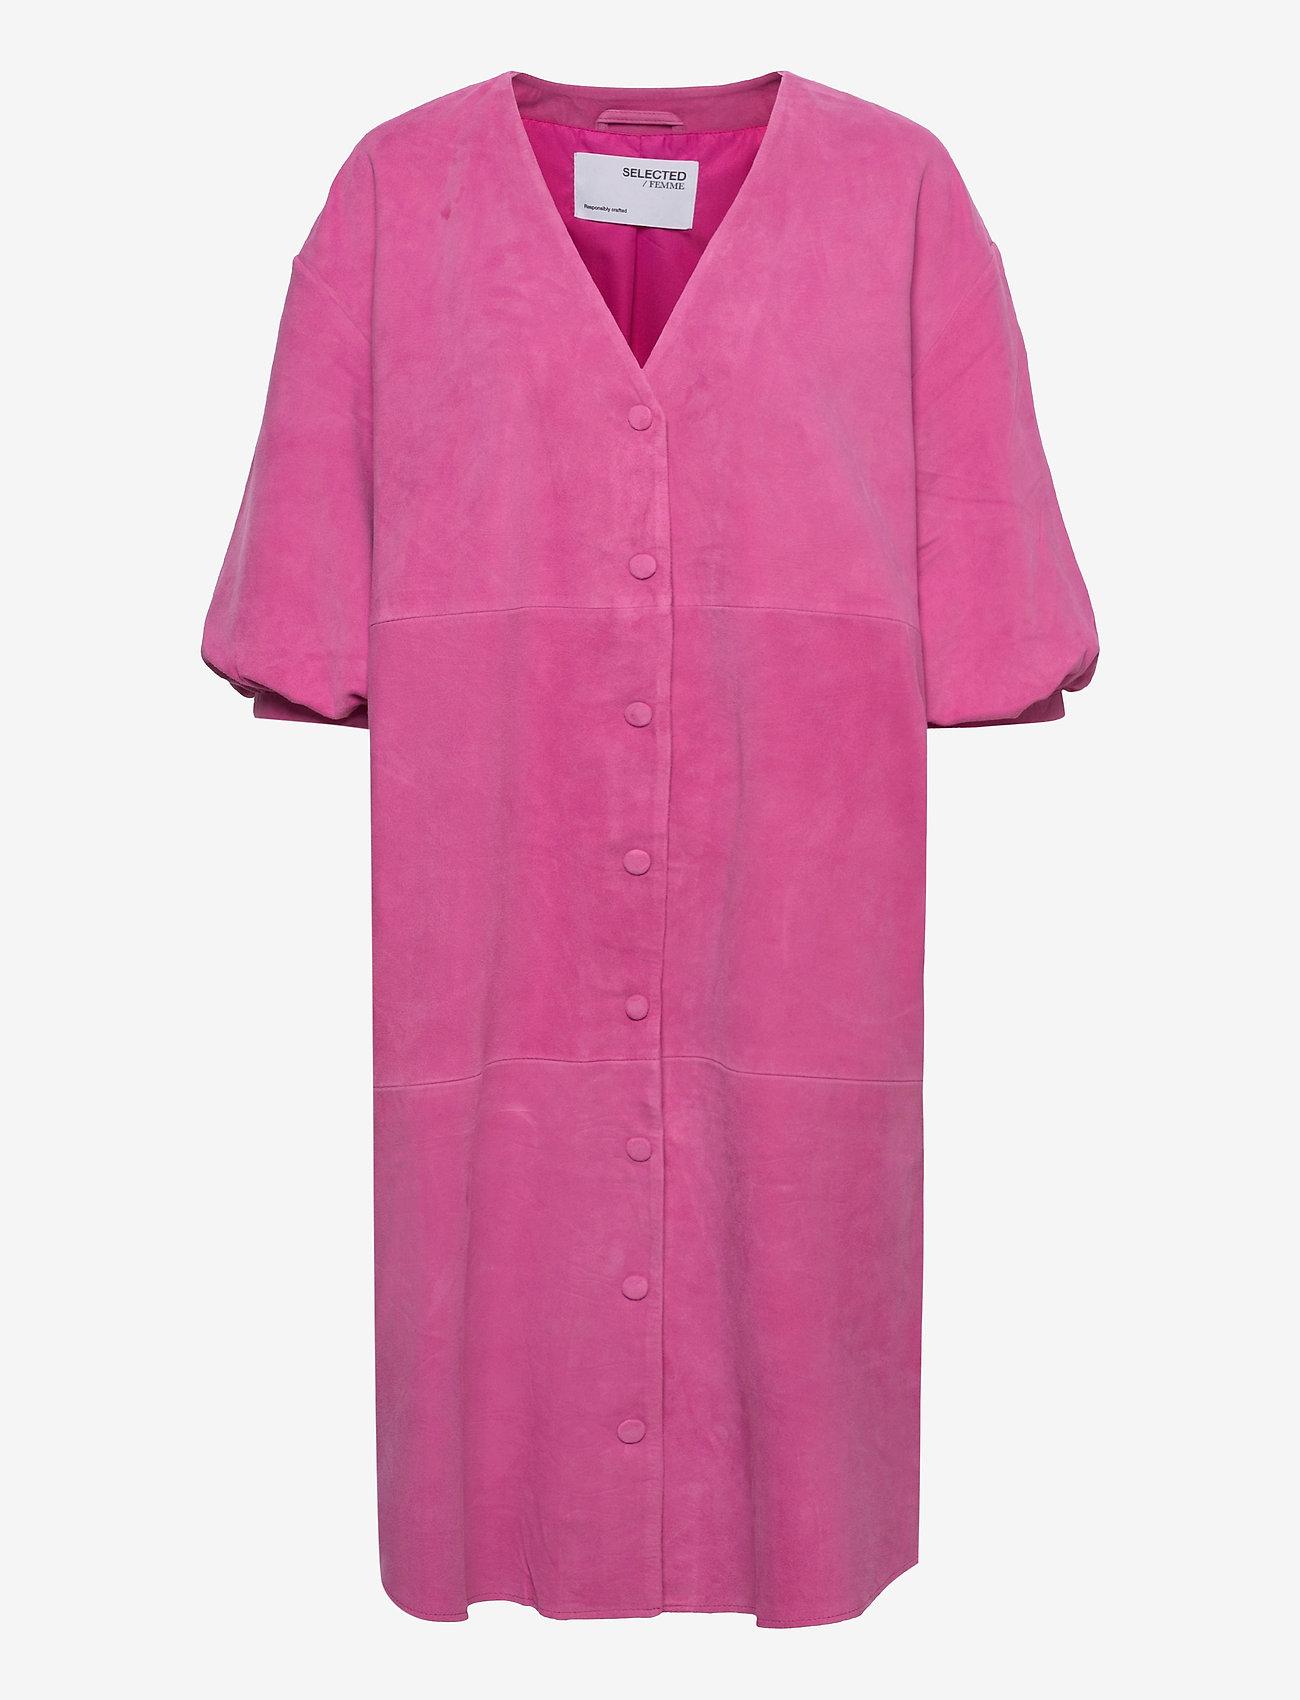 Selected Femme - SLFVANESSA 2/4 LEATHER SHIRT DRESS - alltagskleider - rose violet - 0